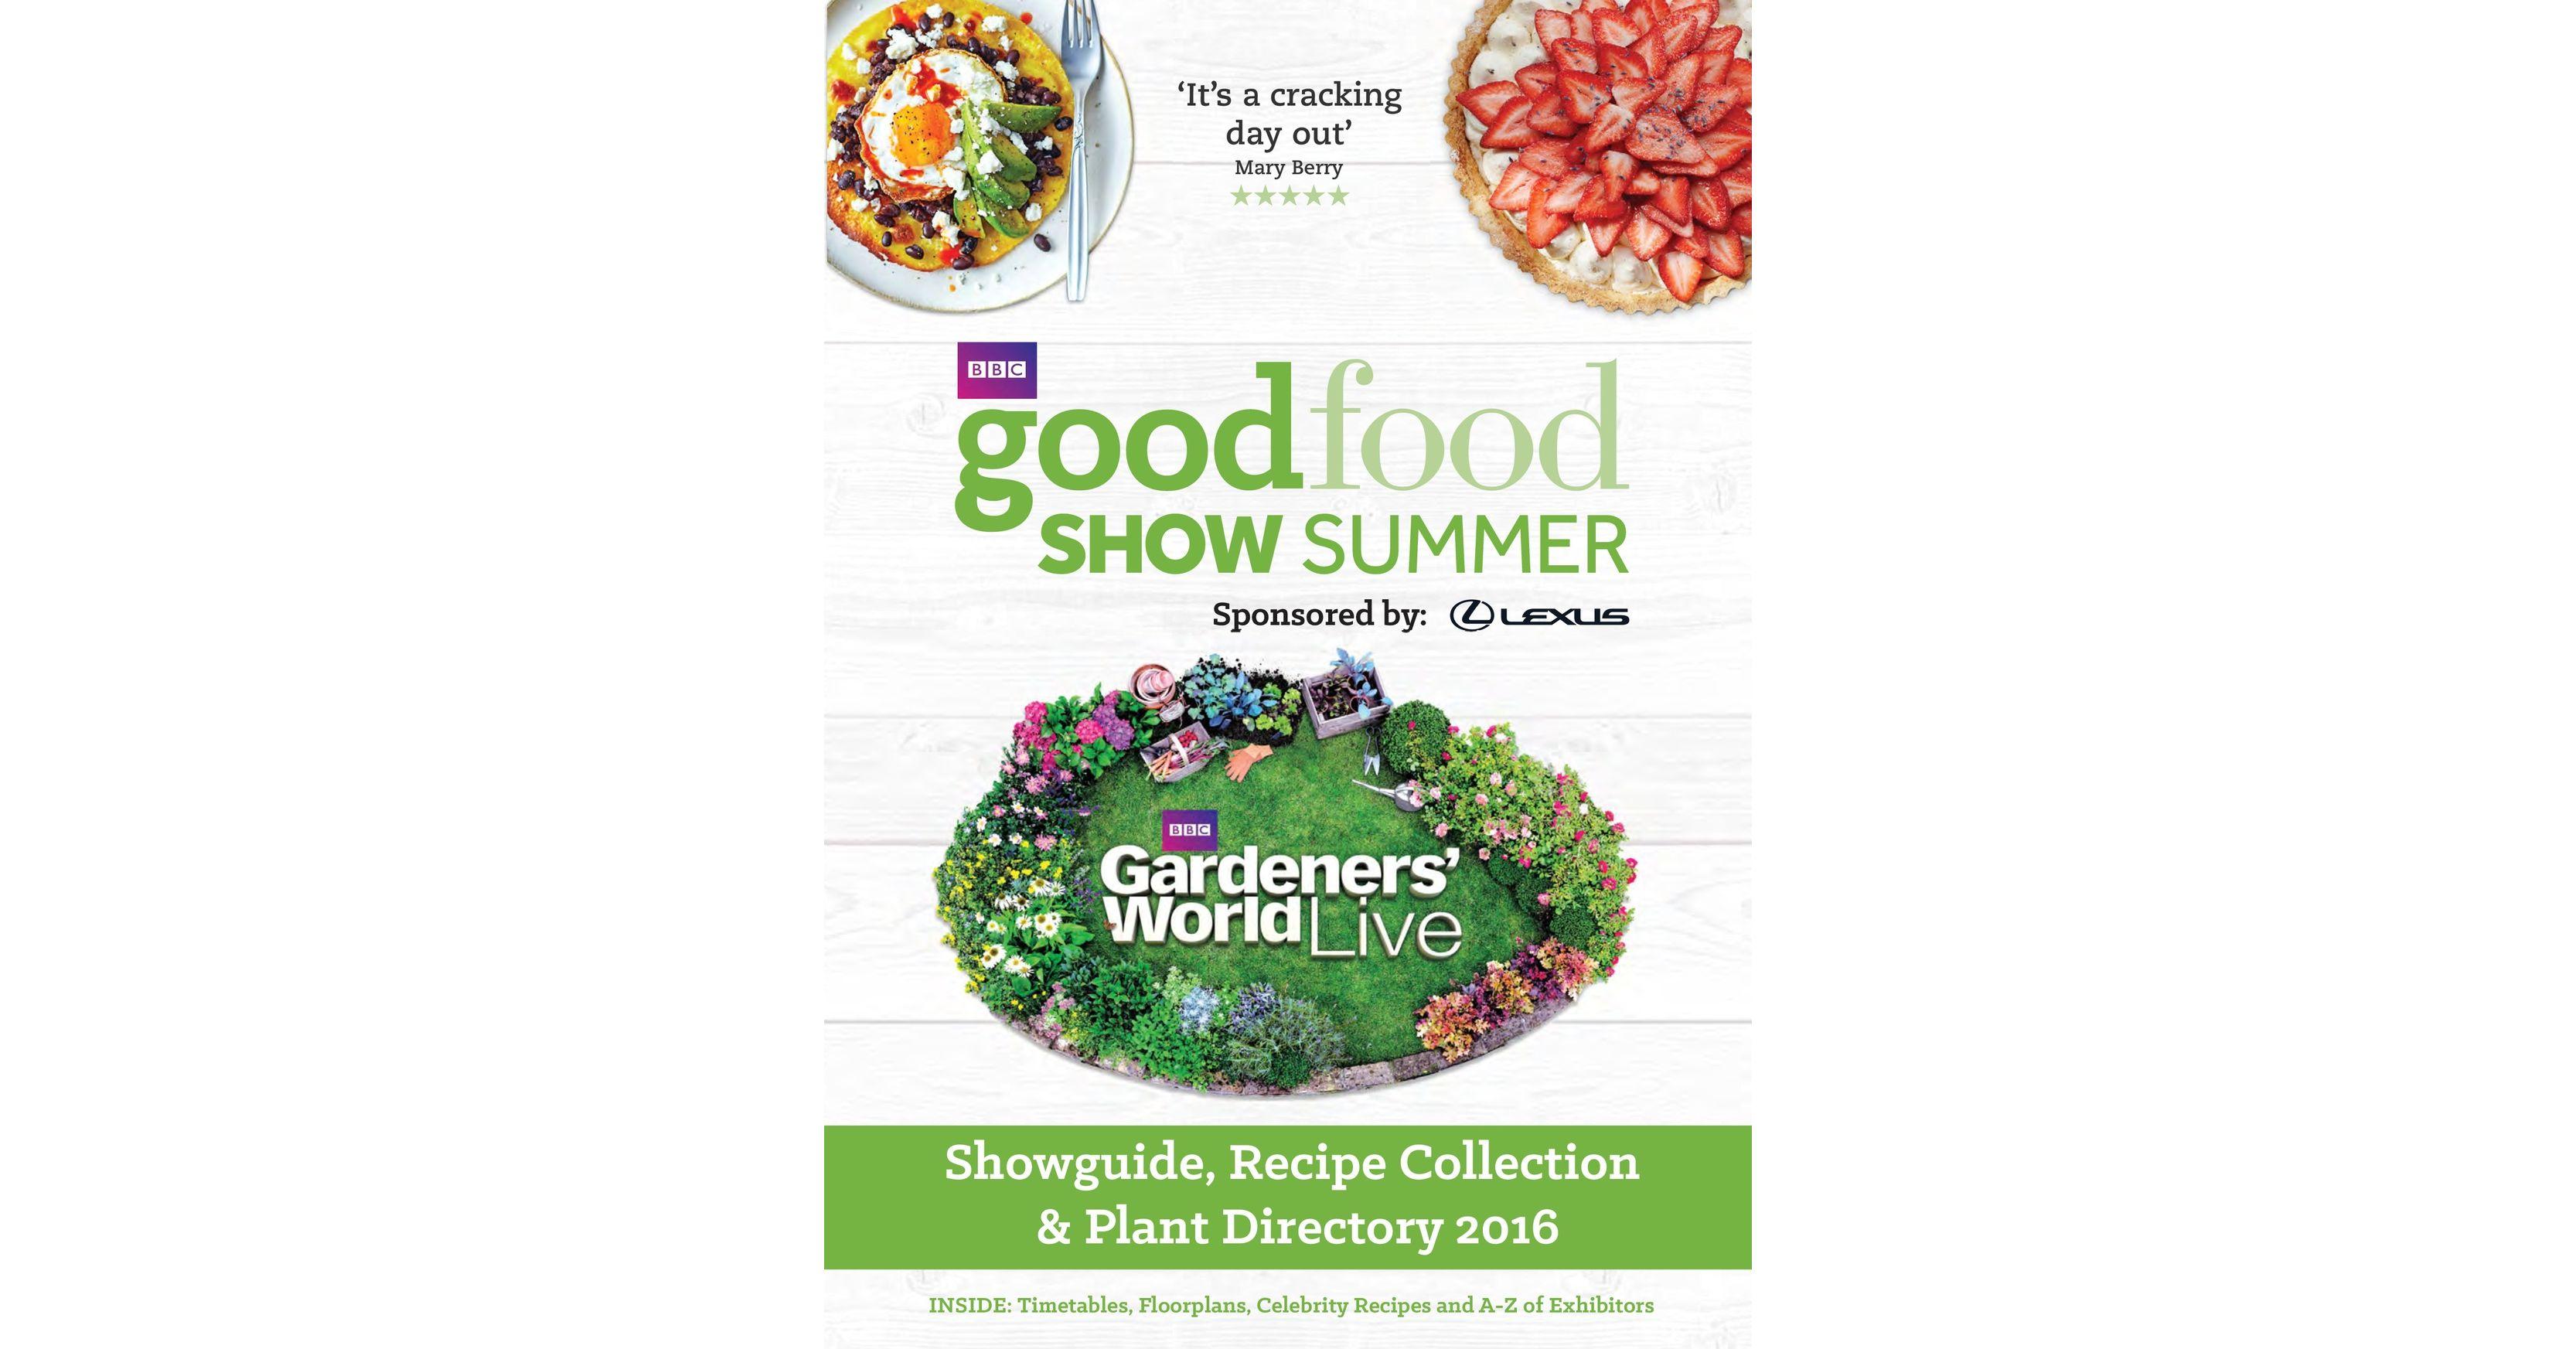 Bbc gardeners world live bbc good food show summer 2016 forumfinder Images